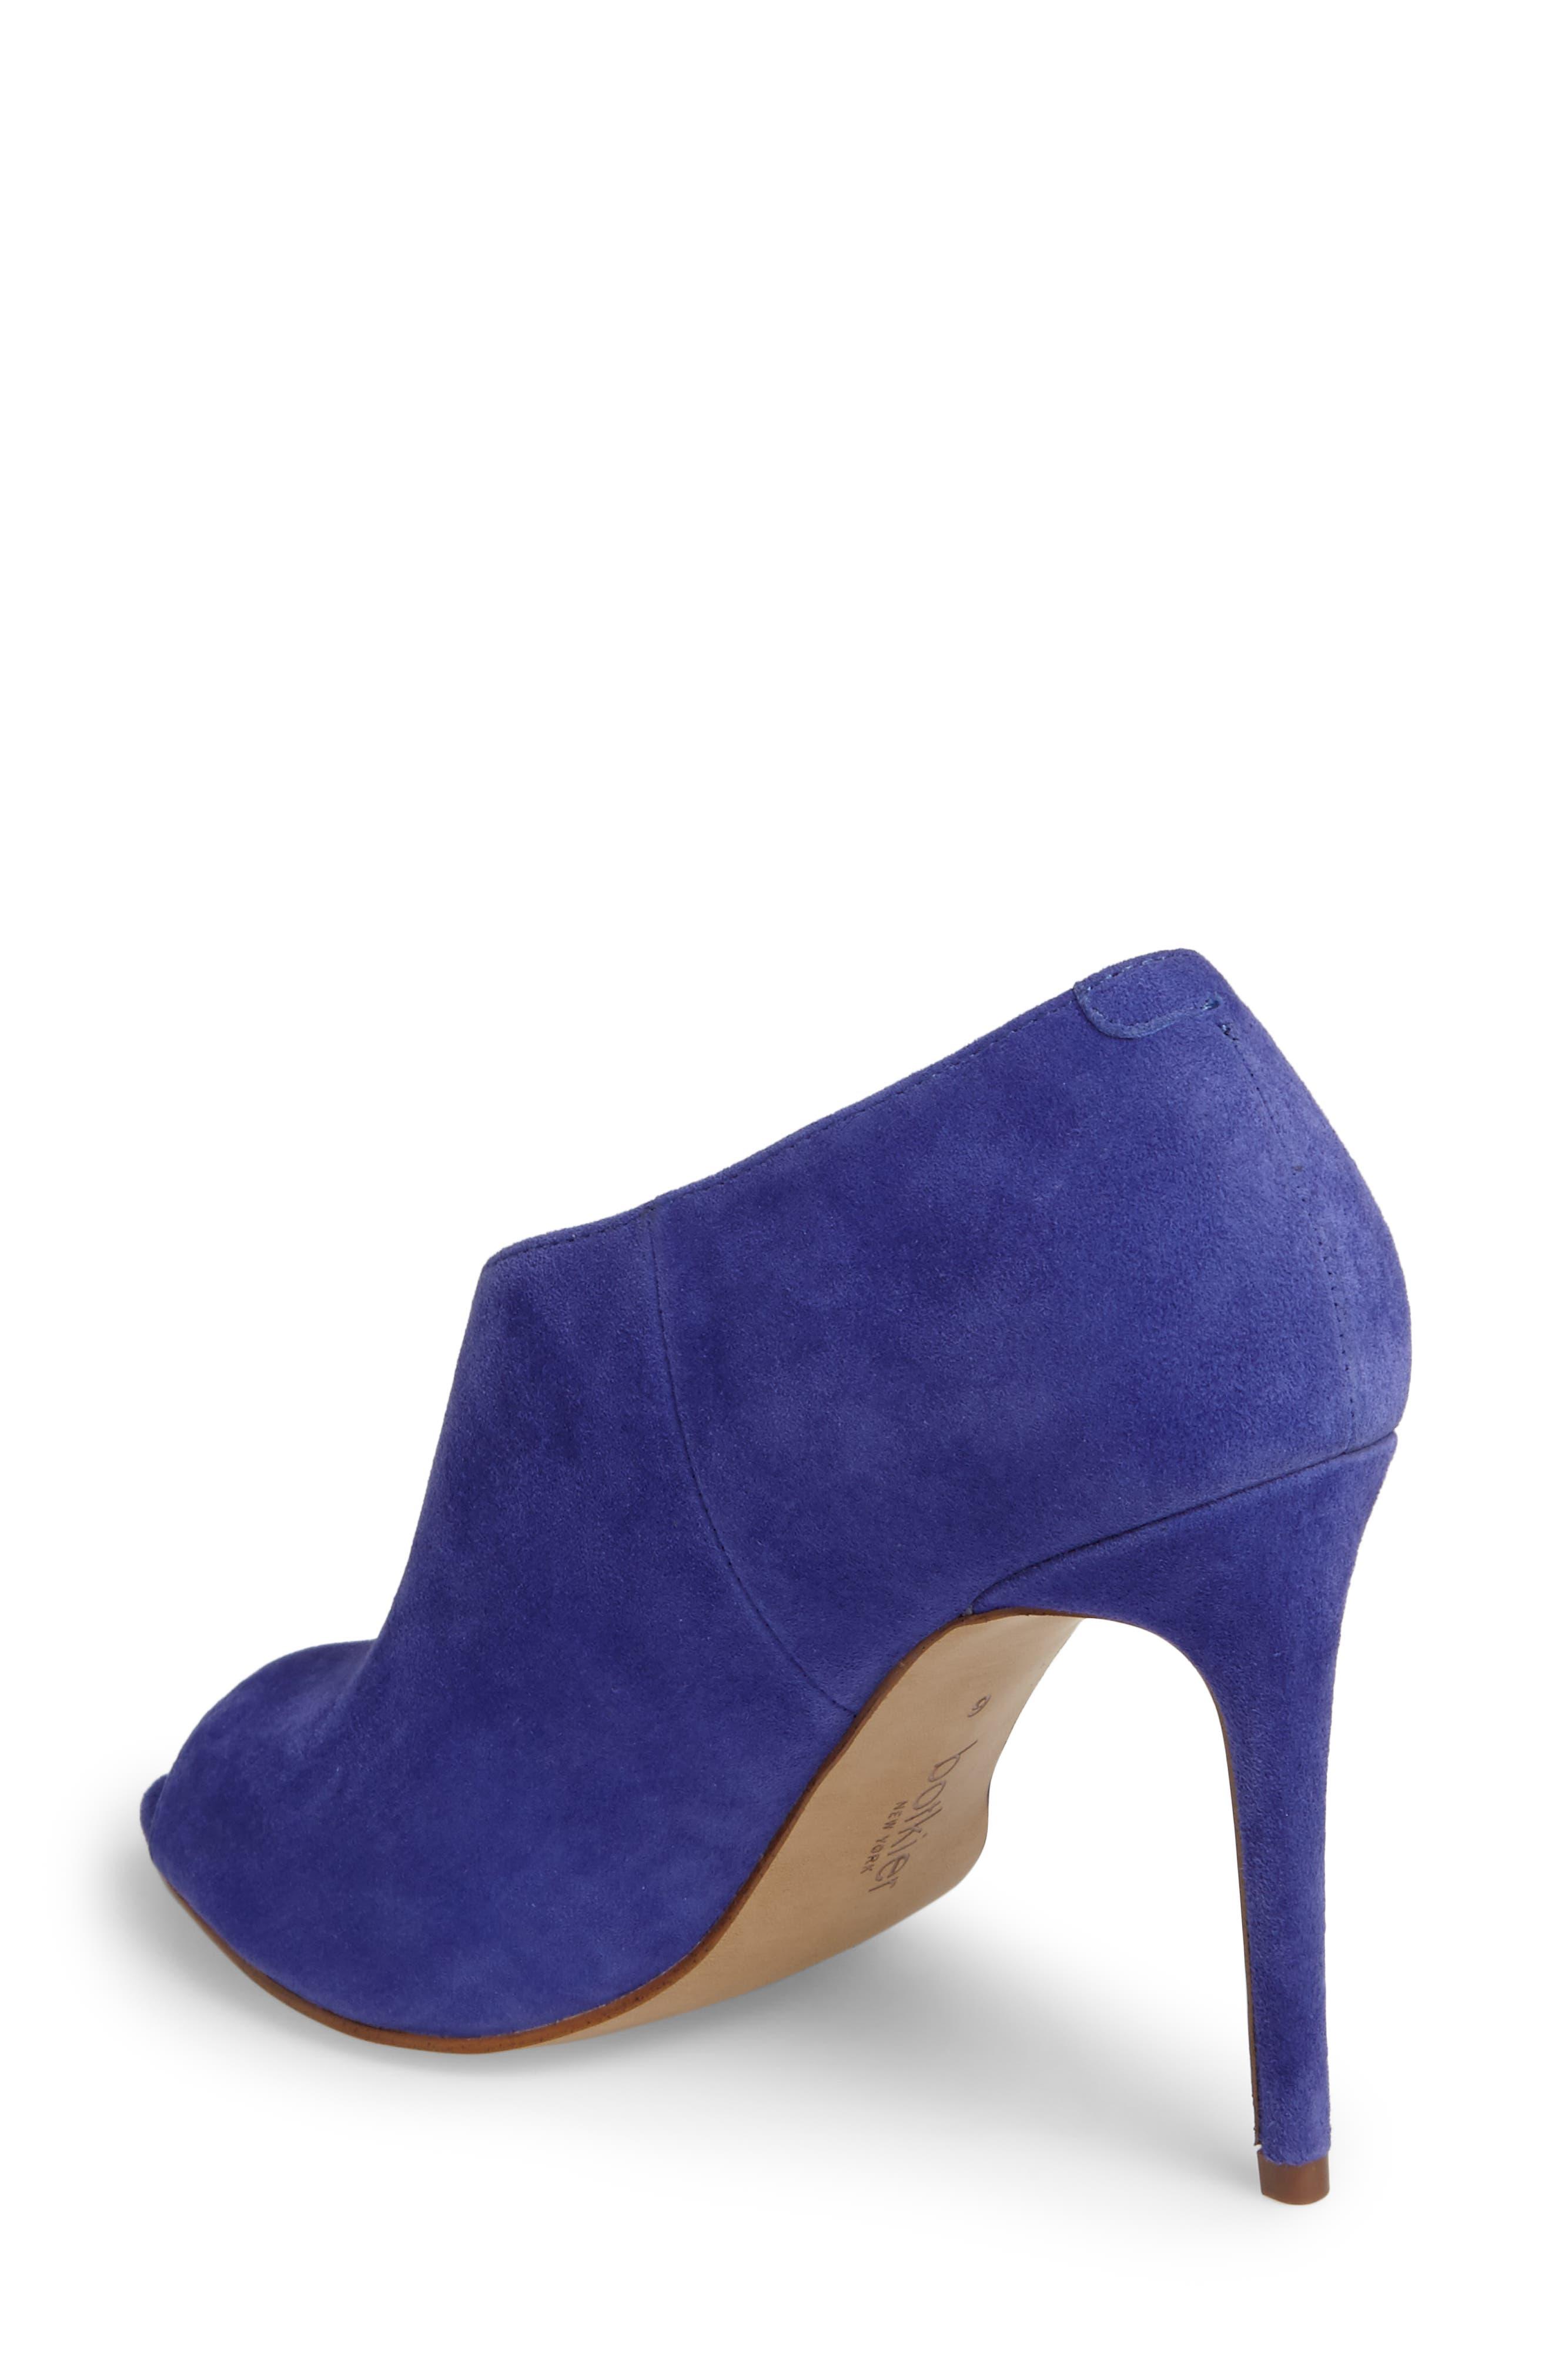 Adelia Asymmetrical Sandal,                             Alternate thumbnail 2, color,                             Blue